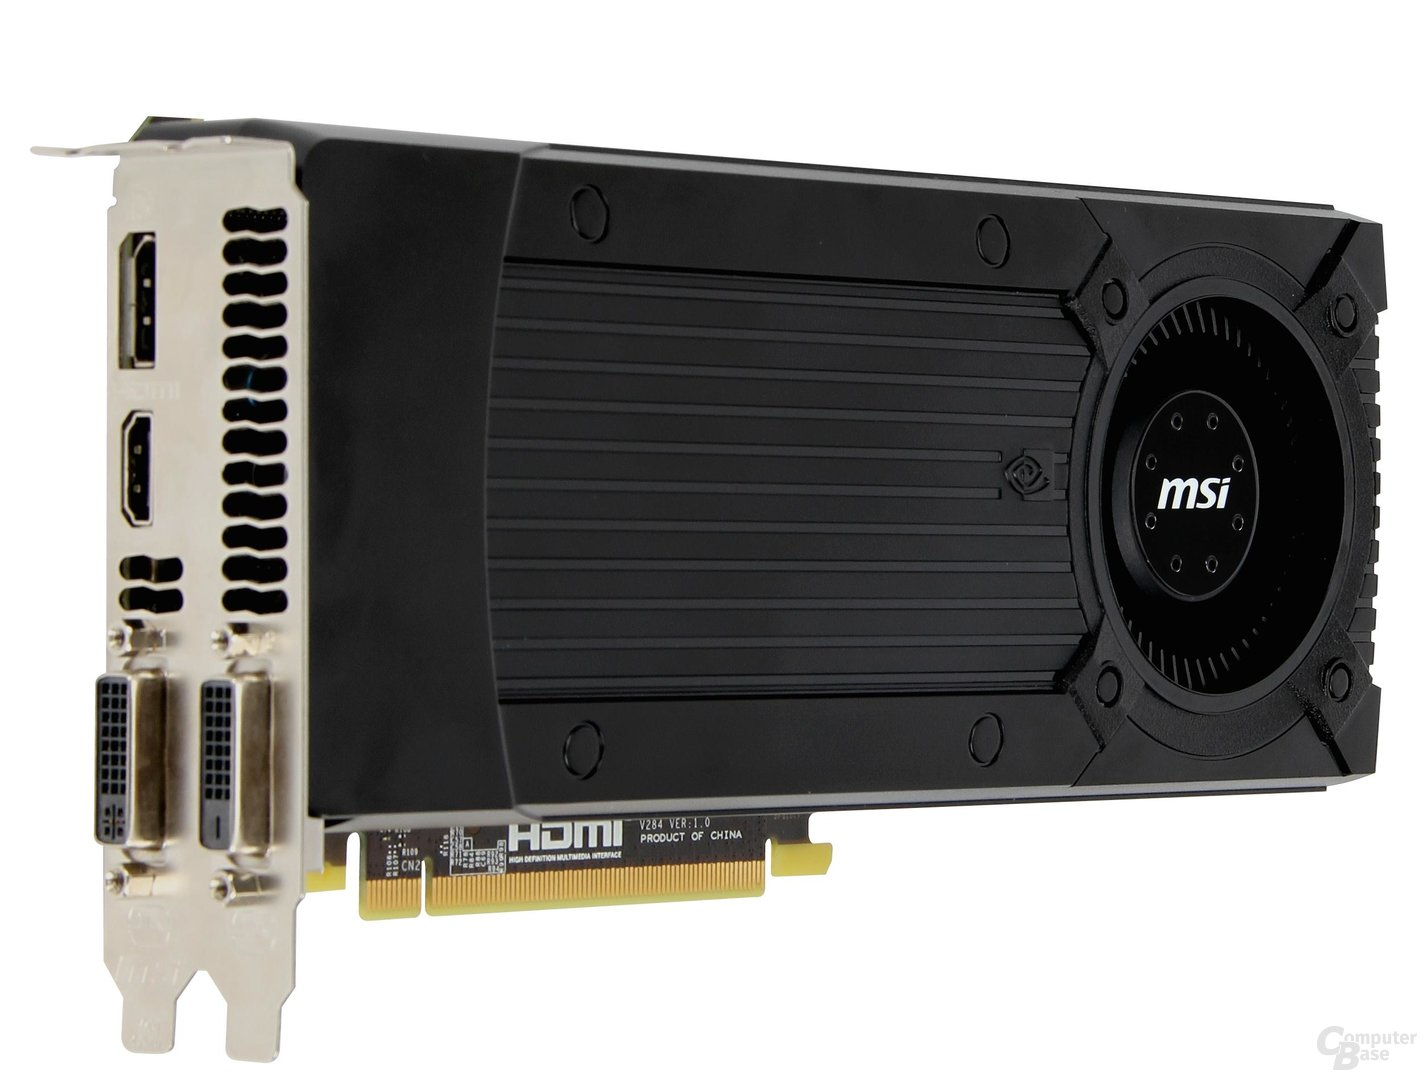 MSI GeForce GTX 670